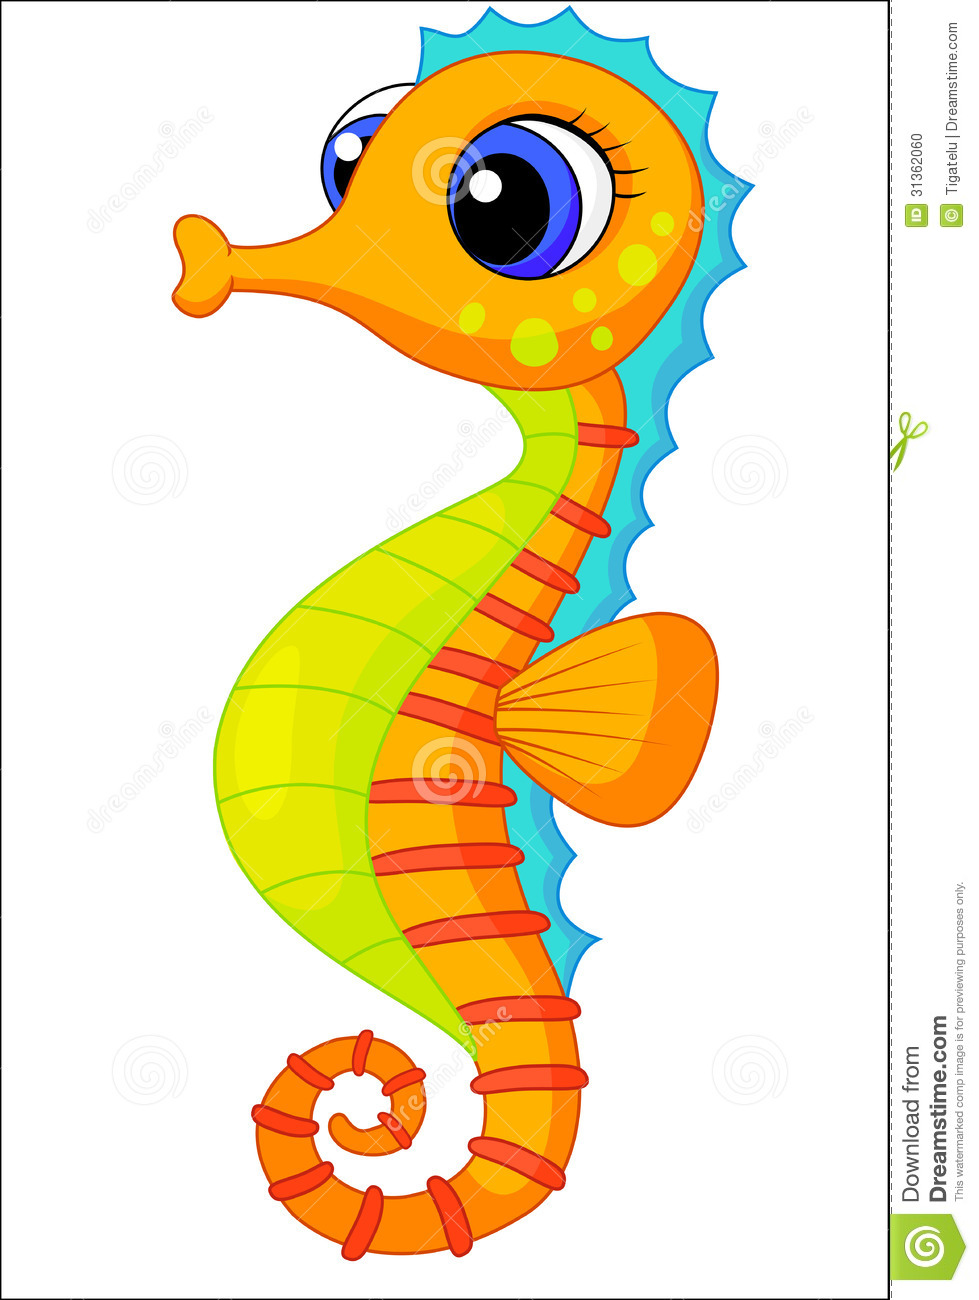 Seahorse clipart Seahorse Clipart Images Clipart Free